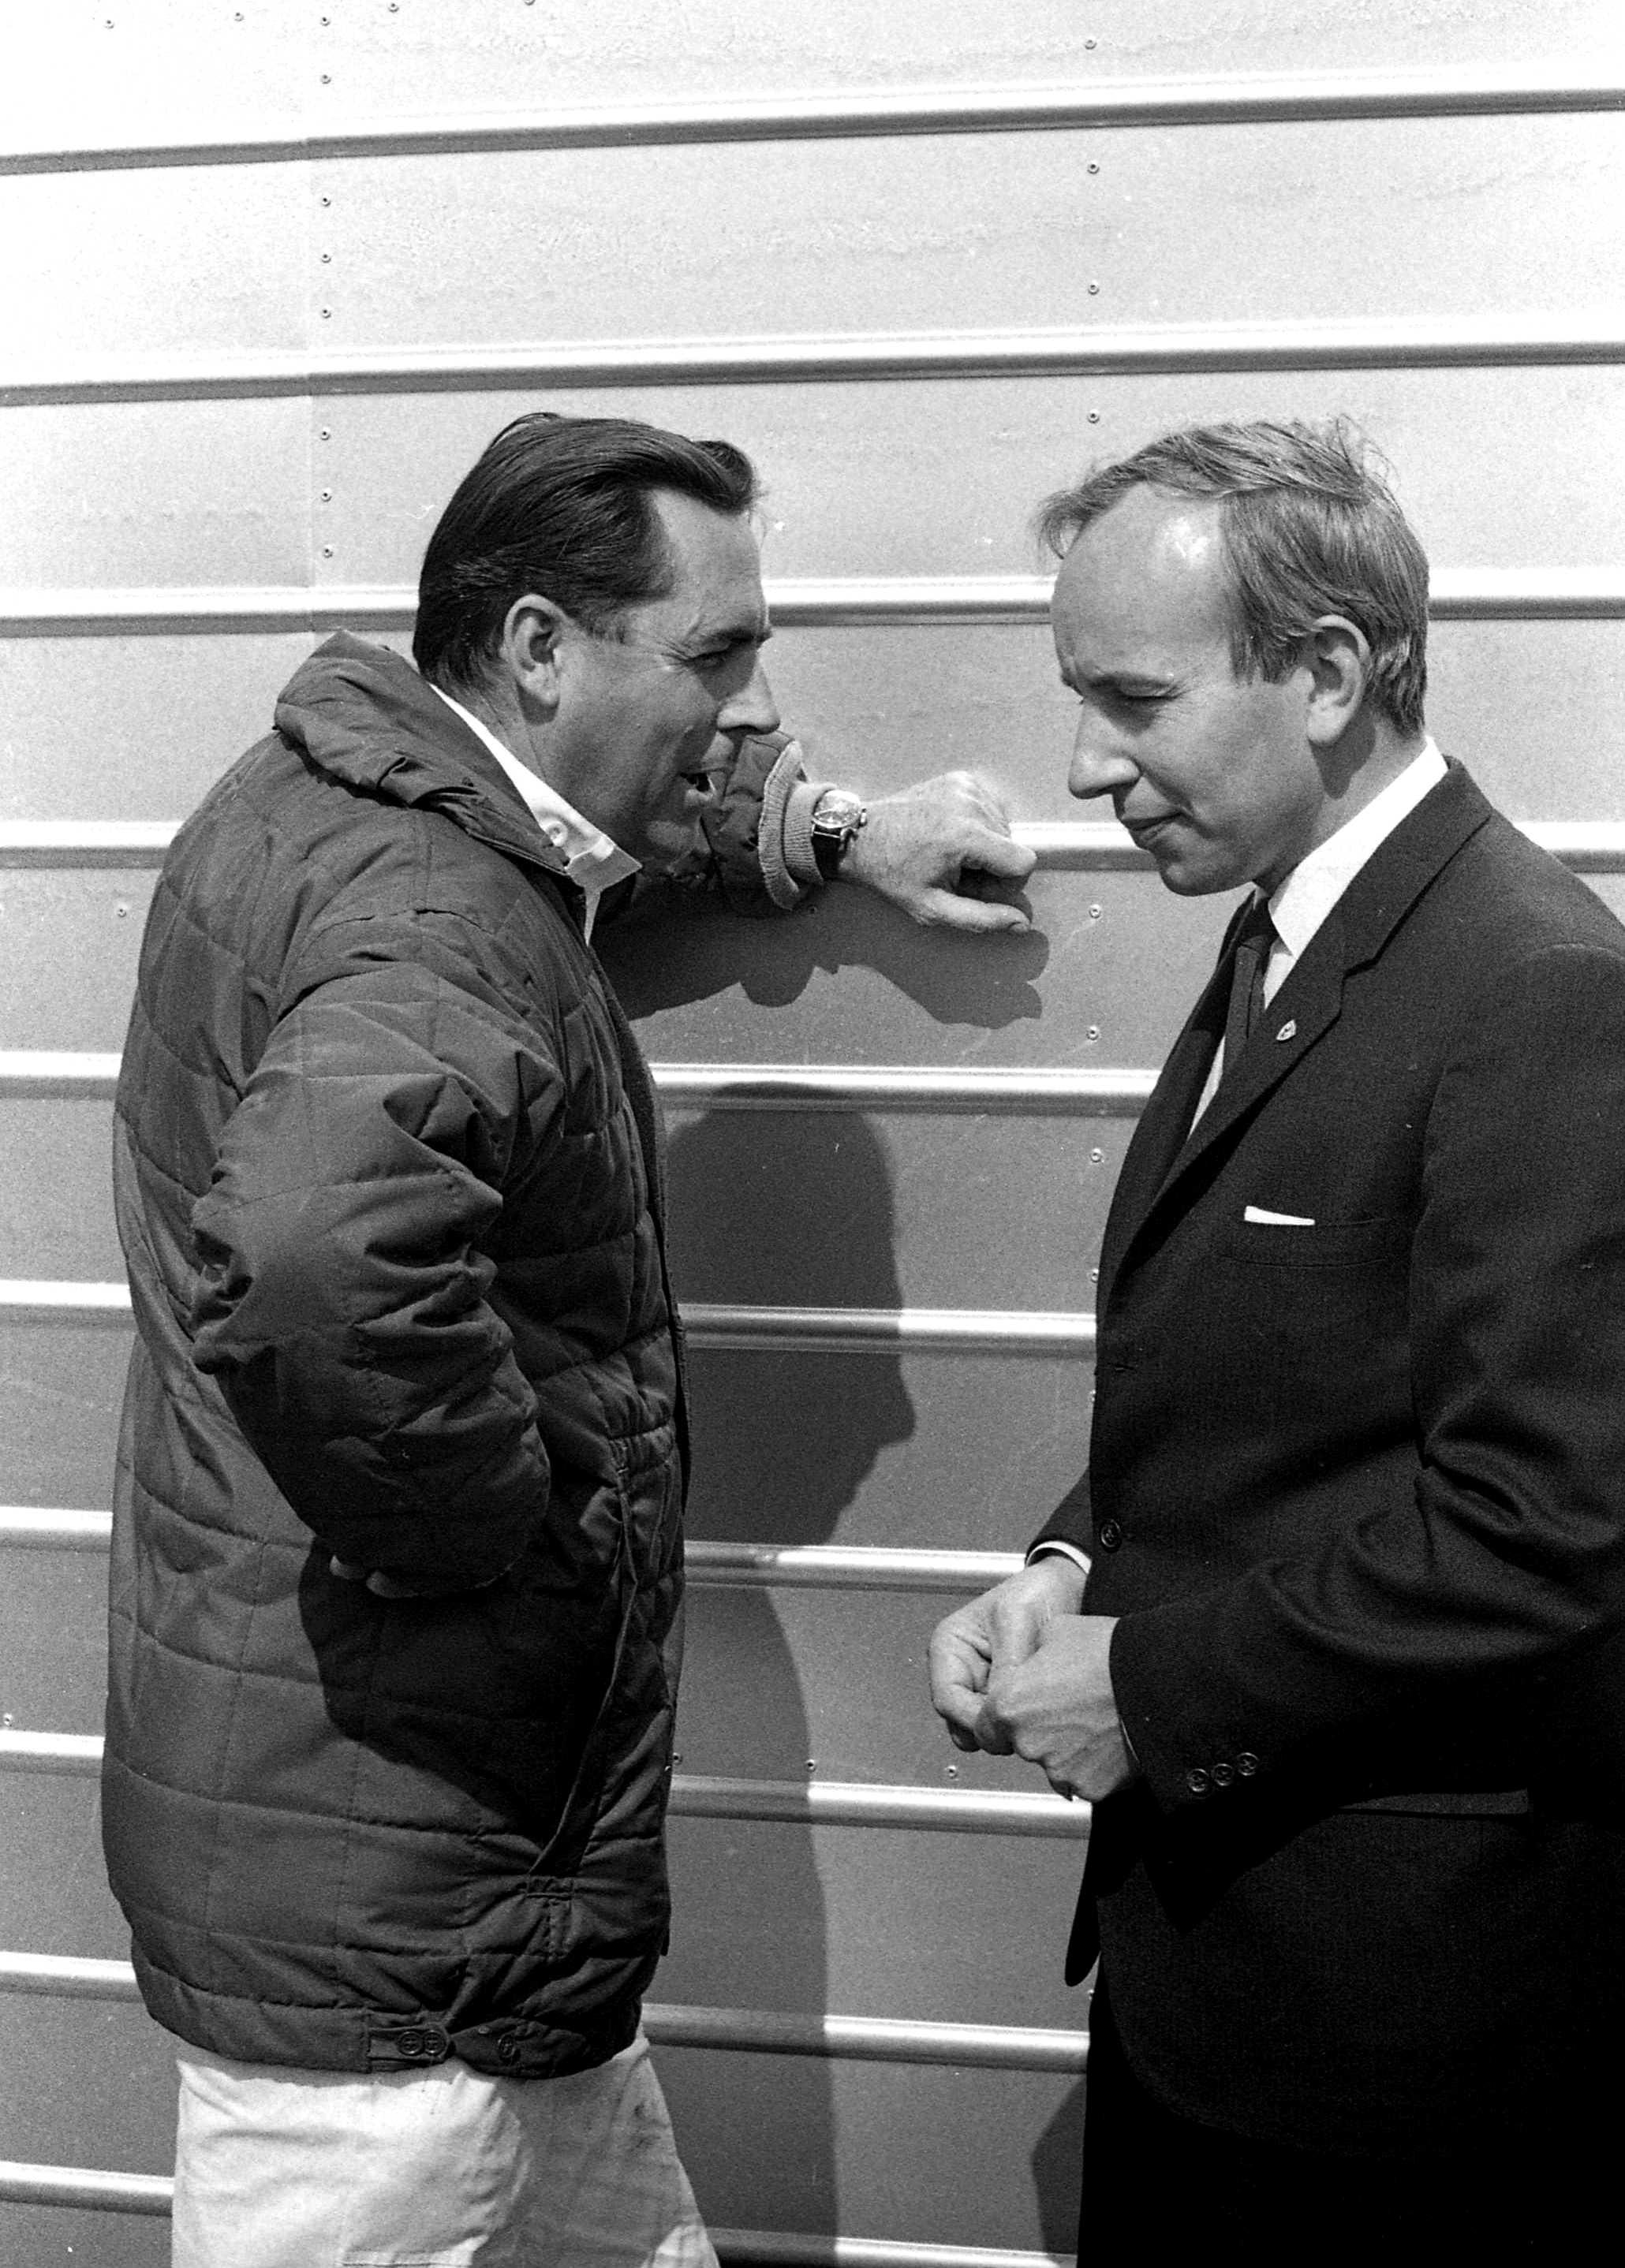 He did speak sometimes. Jack Brabham (left) in deep conversation with John Surtees.